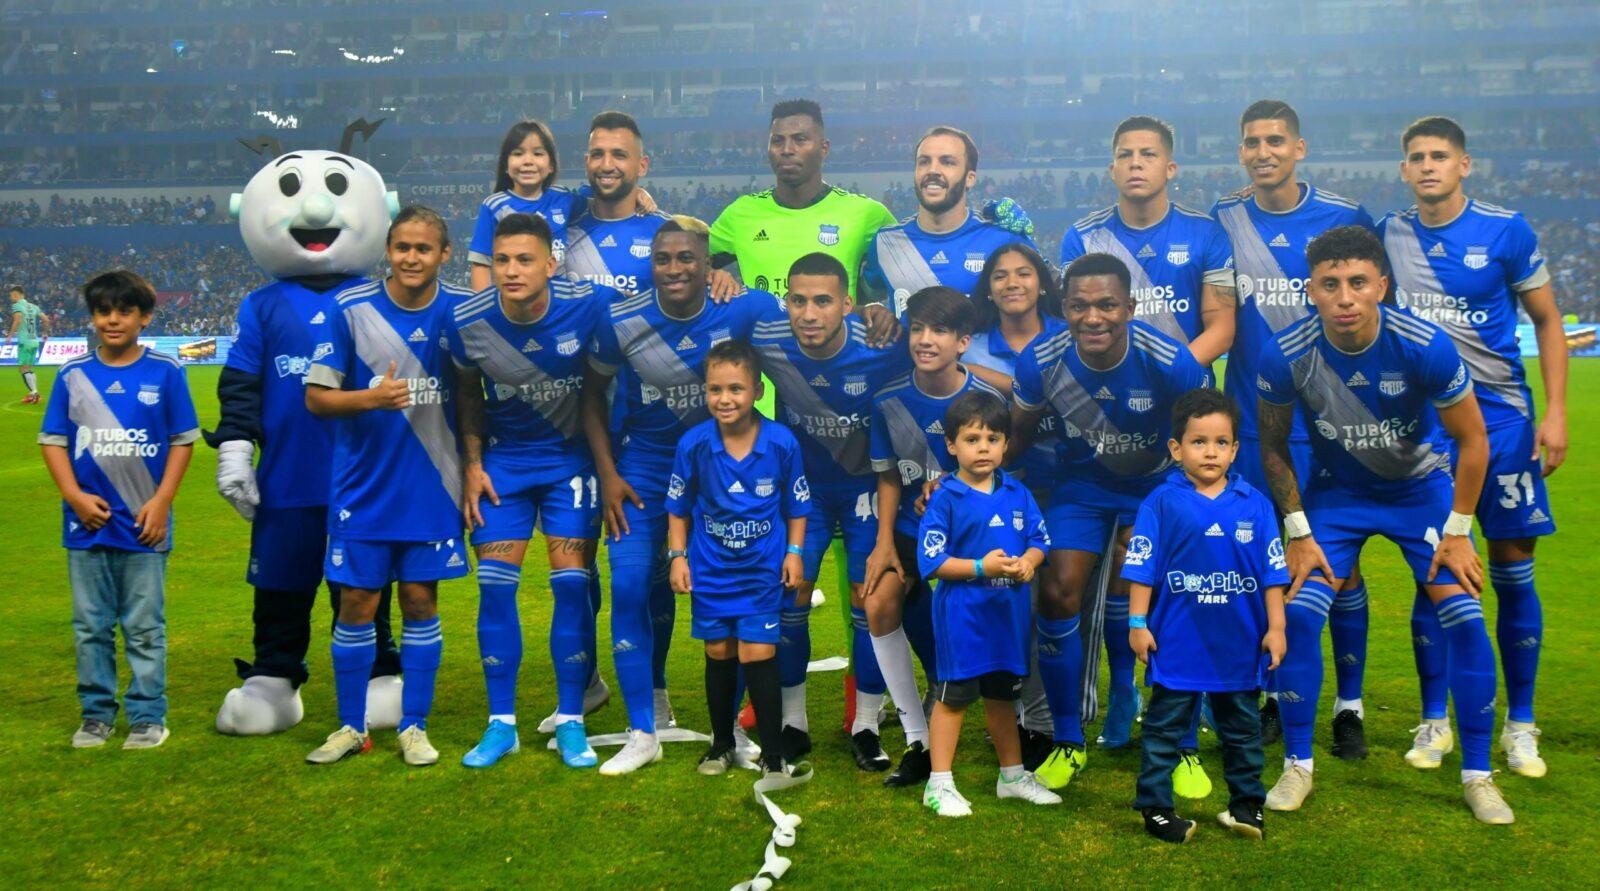 Explosión Azul 2020 : Emelec 2x0 Liga de Portoviejo